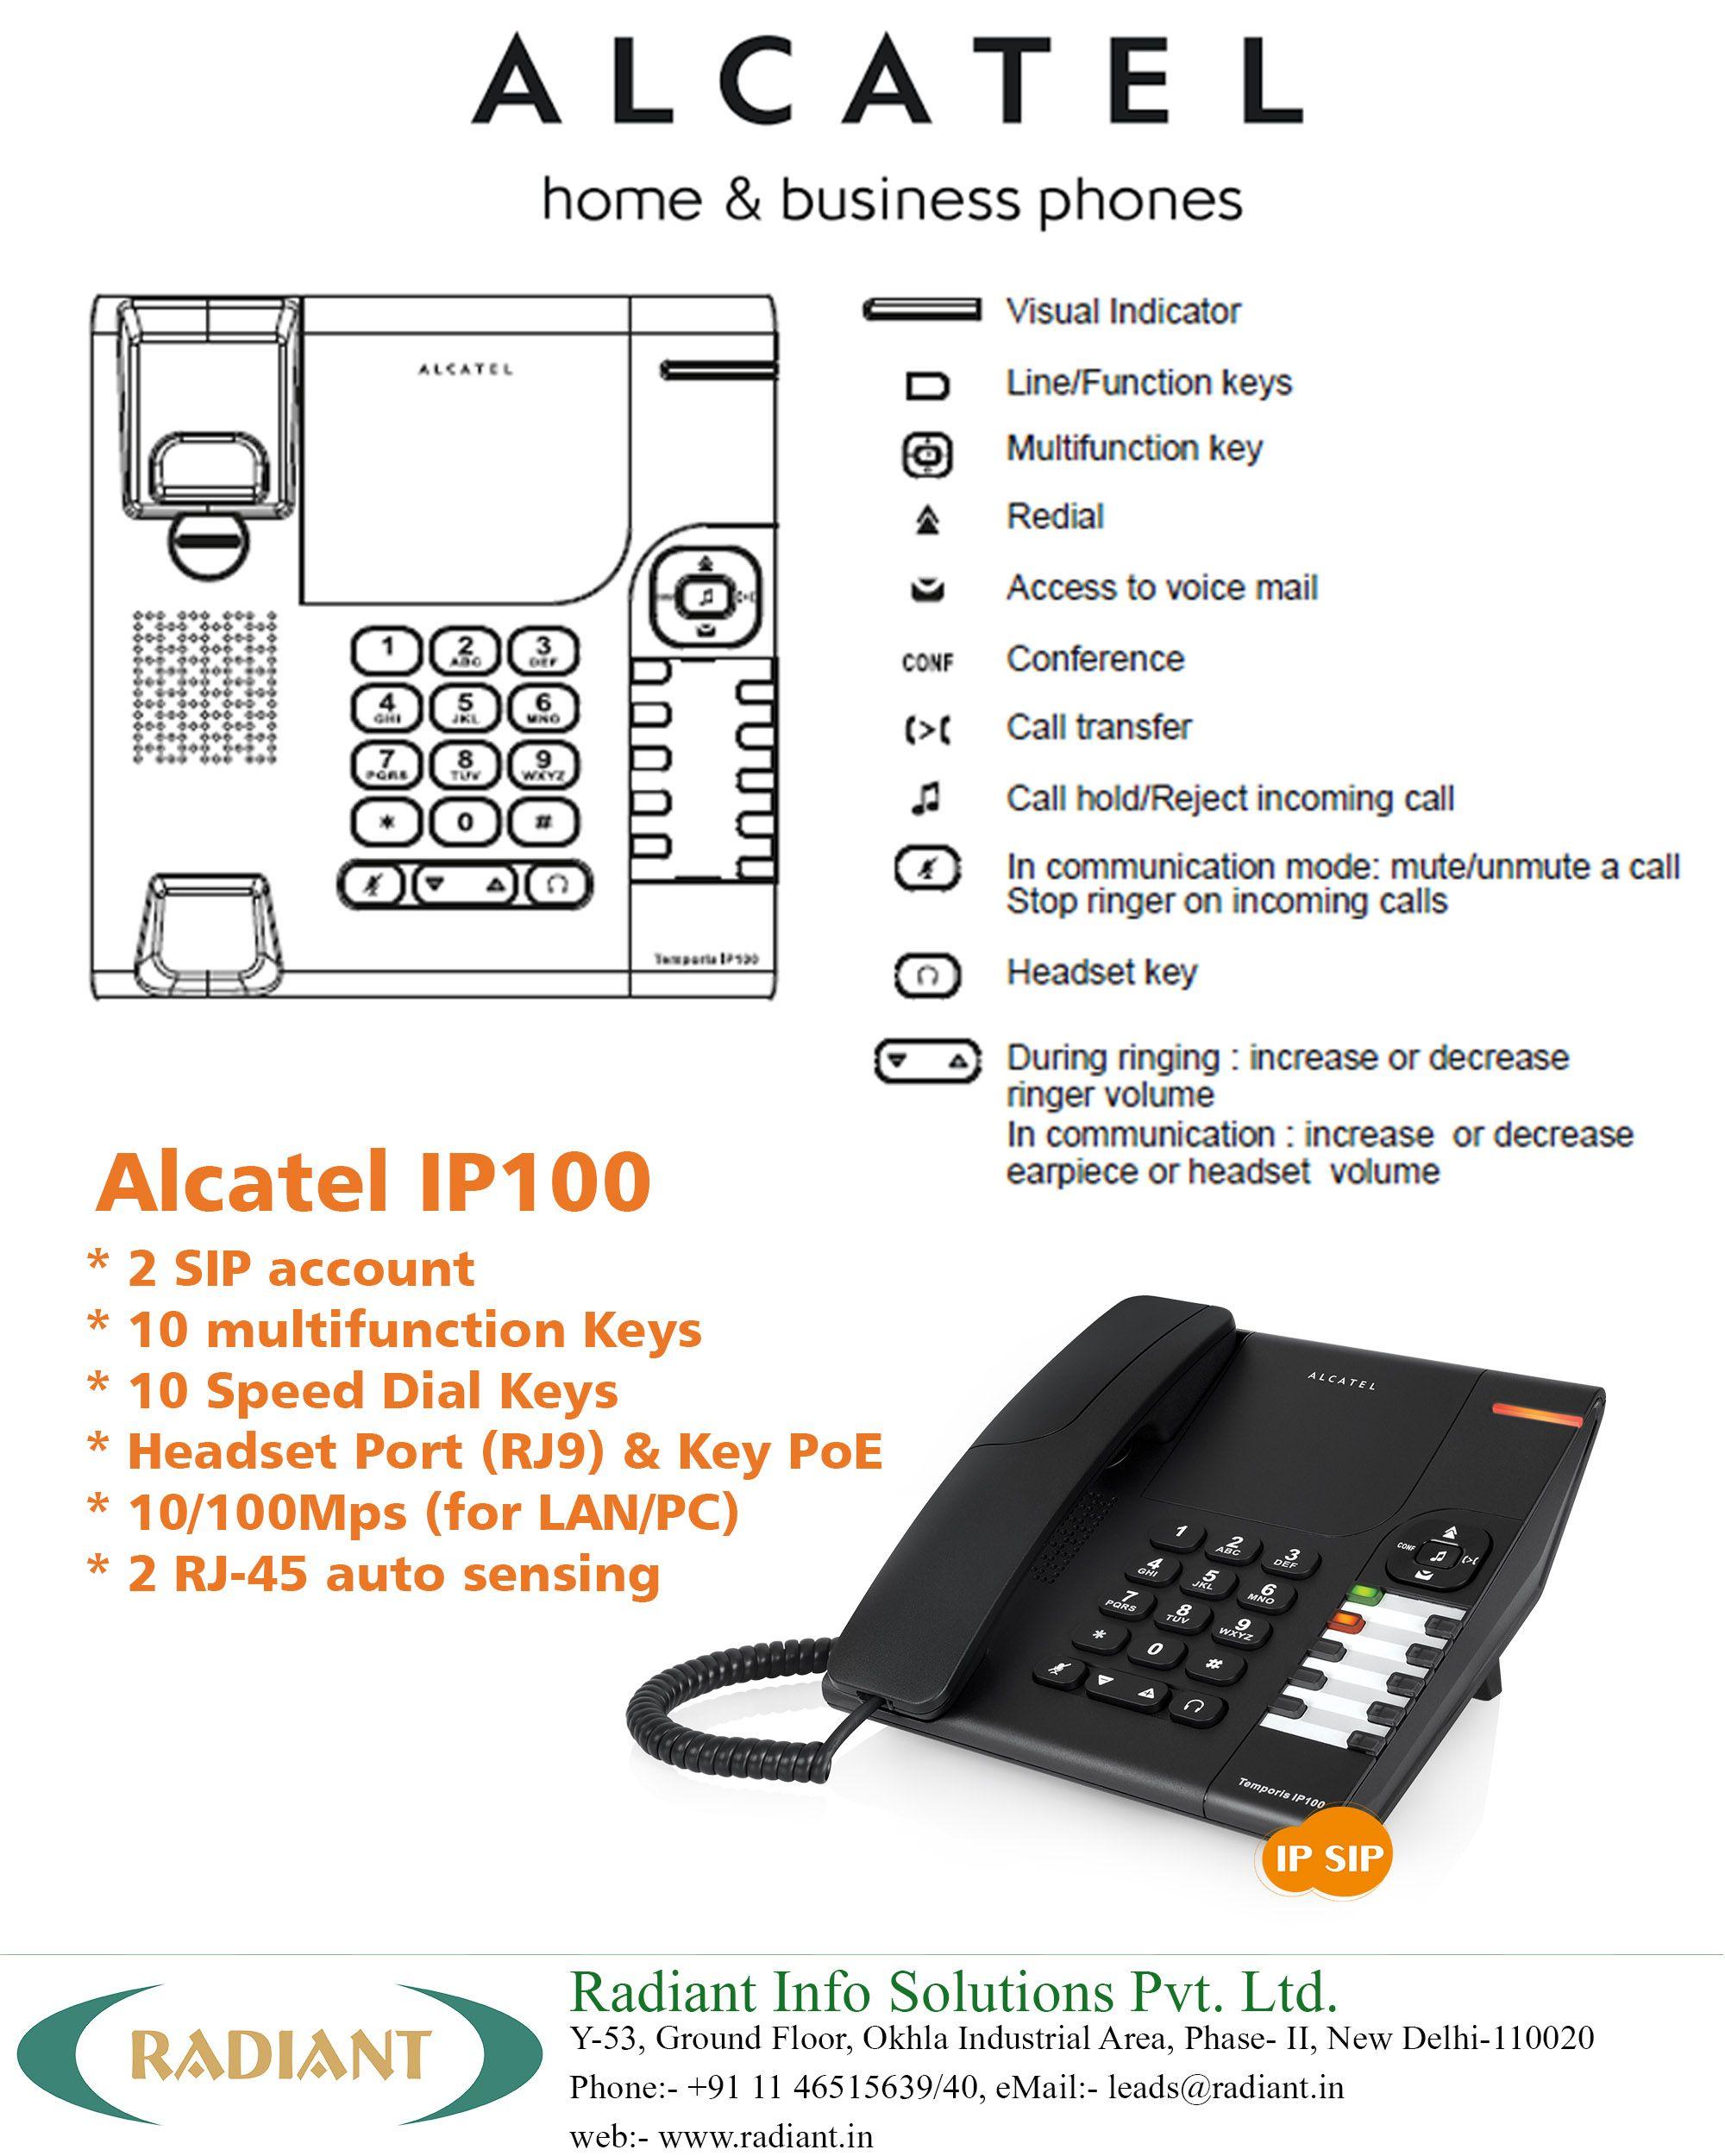 ALCATEL Home and Business Phone - Alcatel IP100. #Alcatel #IP #Phone ...